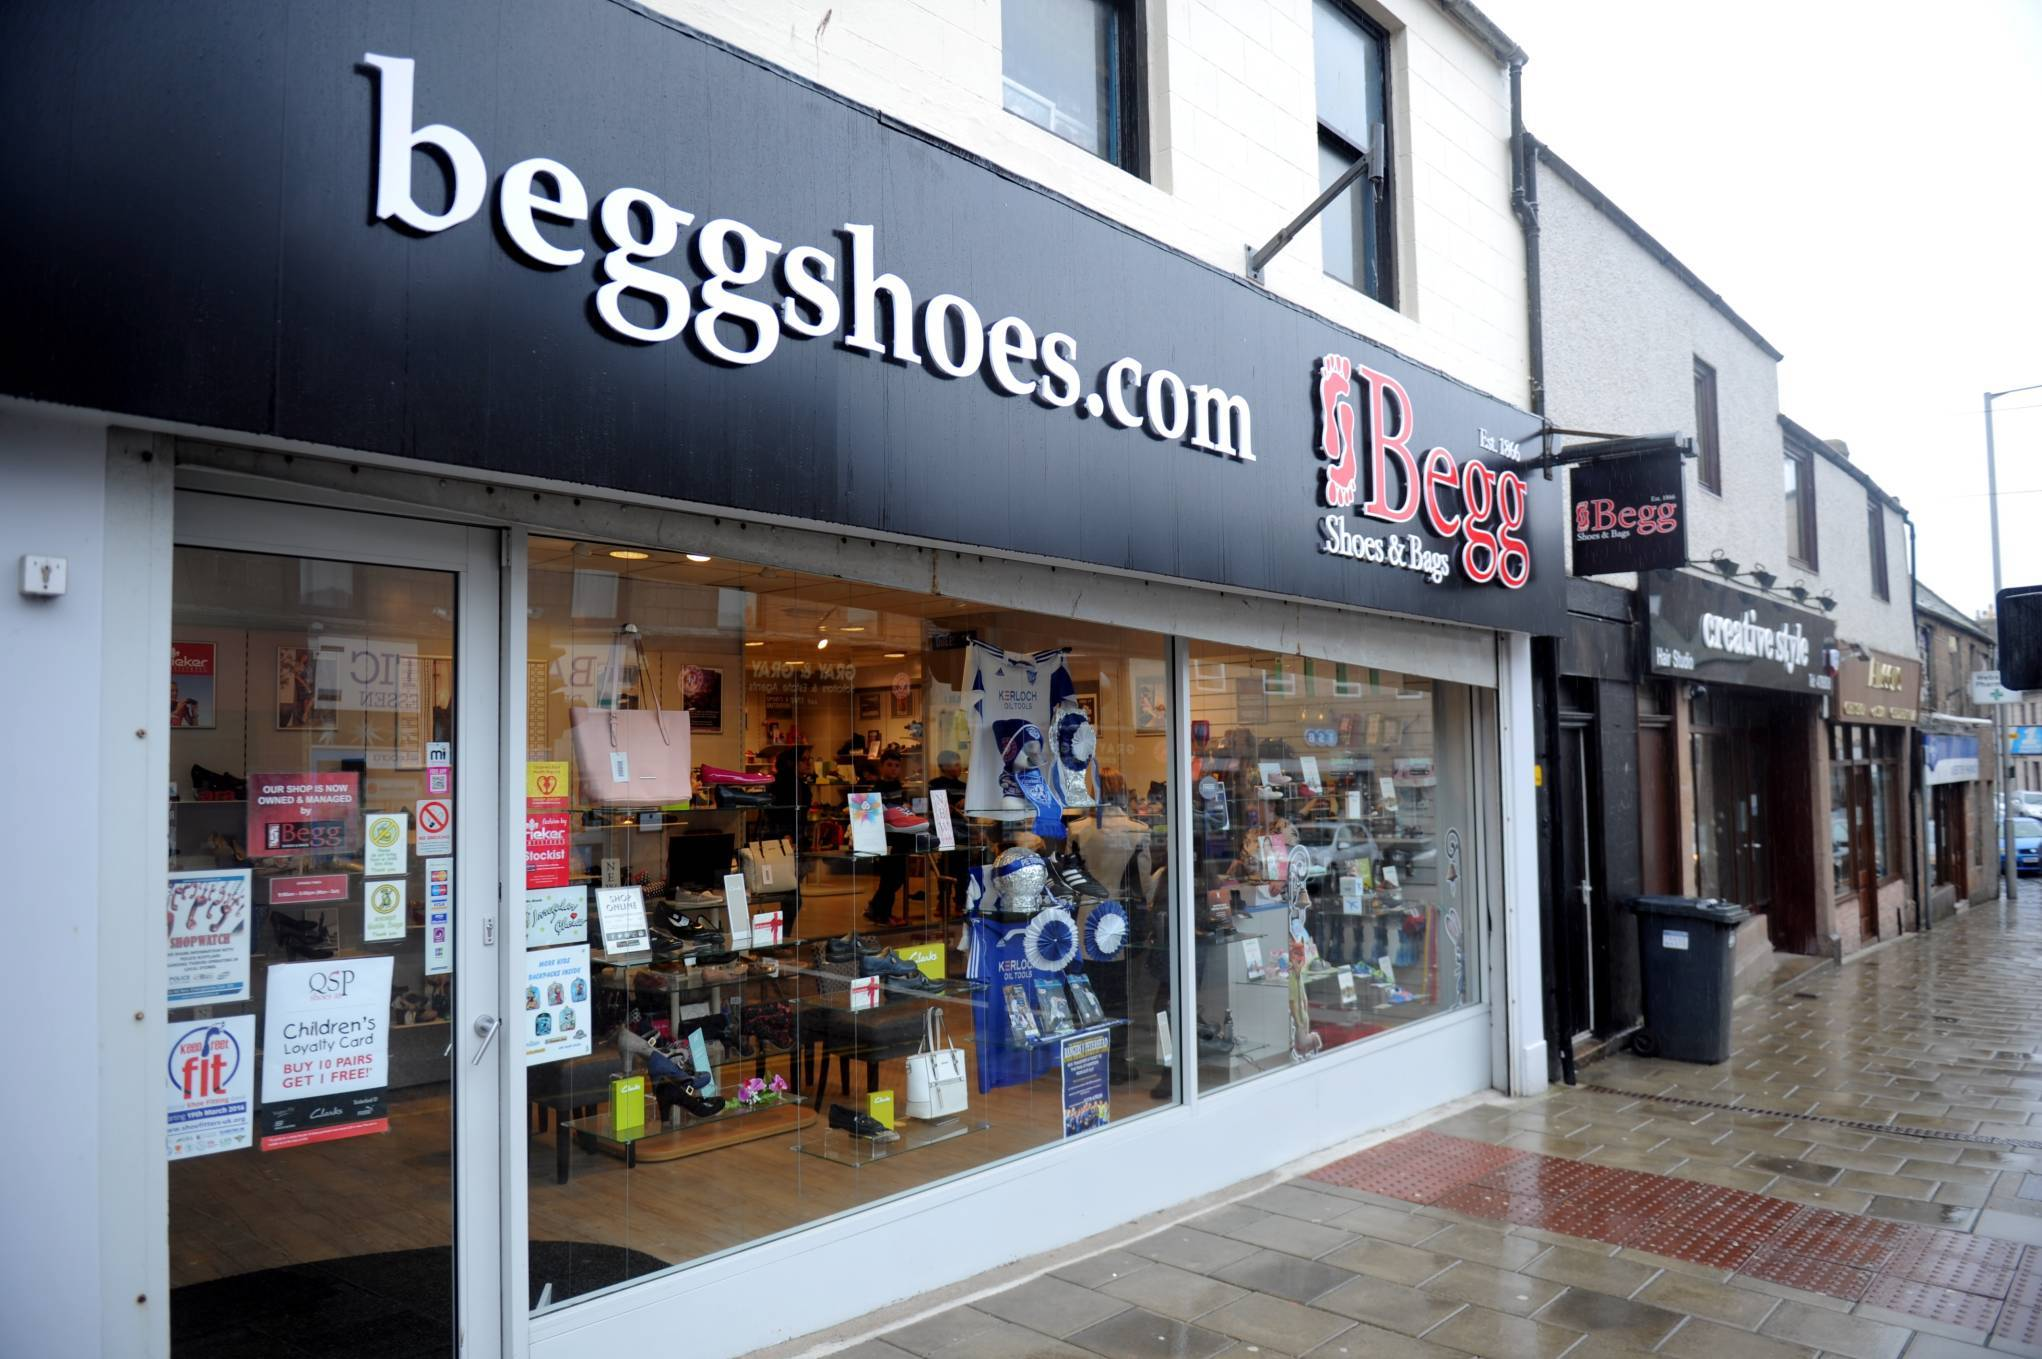 Beggs